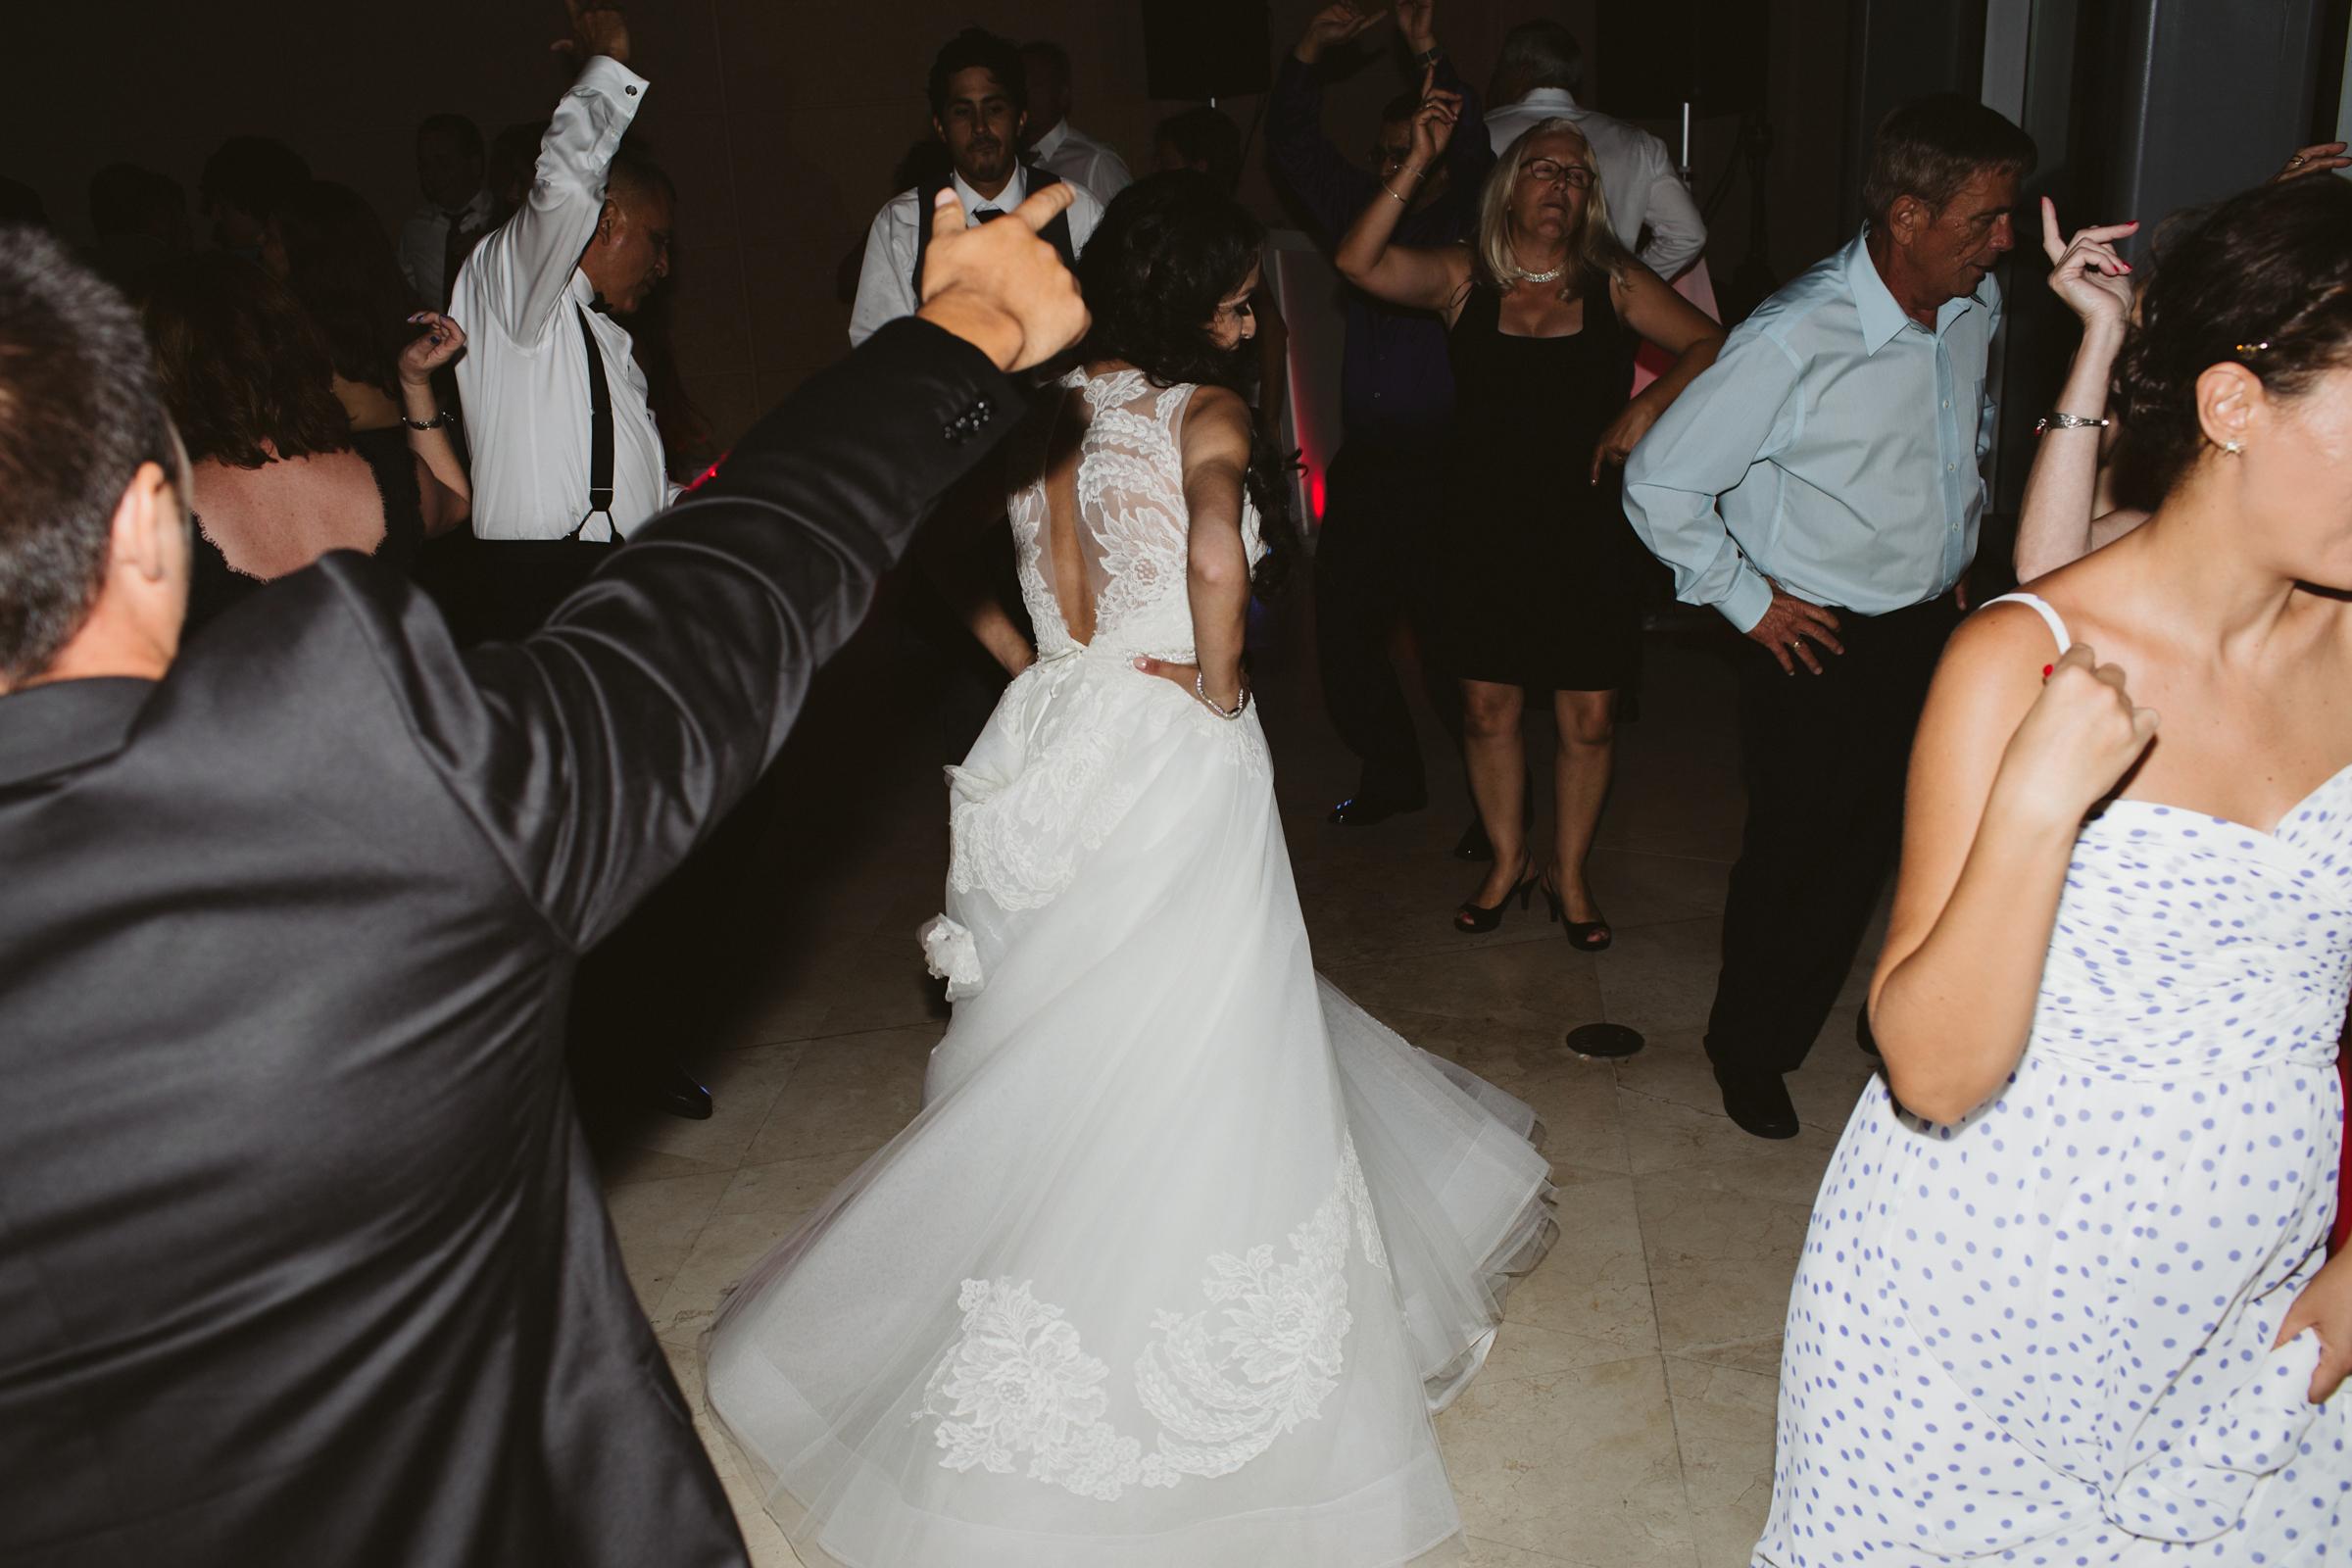 wedding day | MFA St Pete | Vanessa Boy Photography | vanessaboy.com-667.com |final.jpg